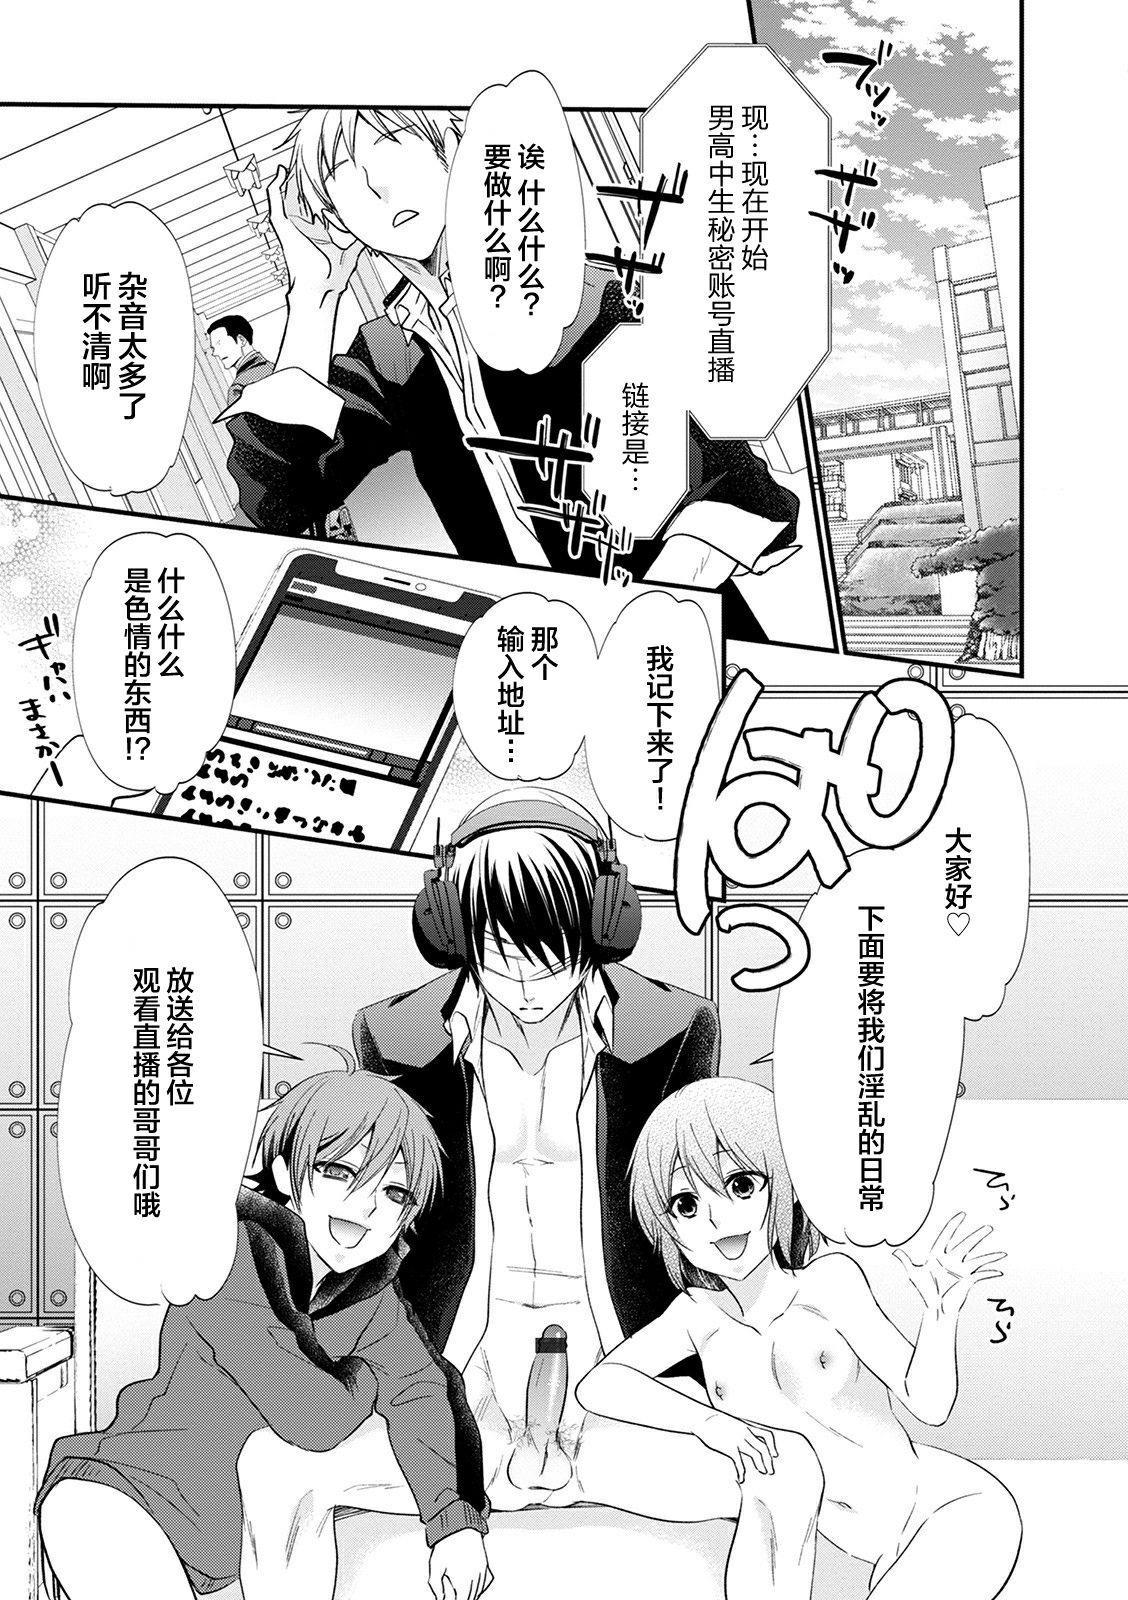 [Naokichi.] Otouto-tachi no Bouken - Indecent brothers adventure Ch. 1-3 [Chinese] [逃亡者×新桥月白日语社] [Digital] 36